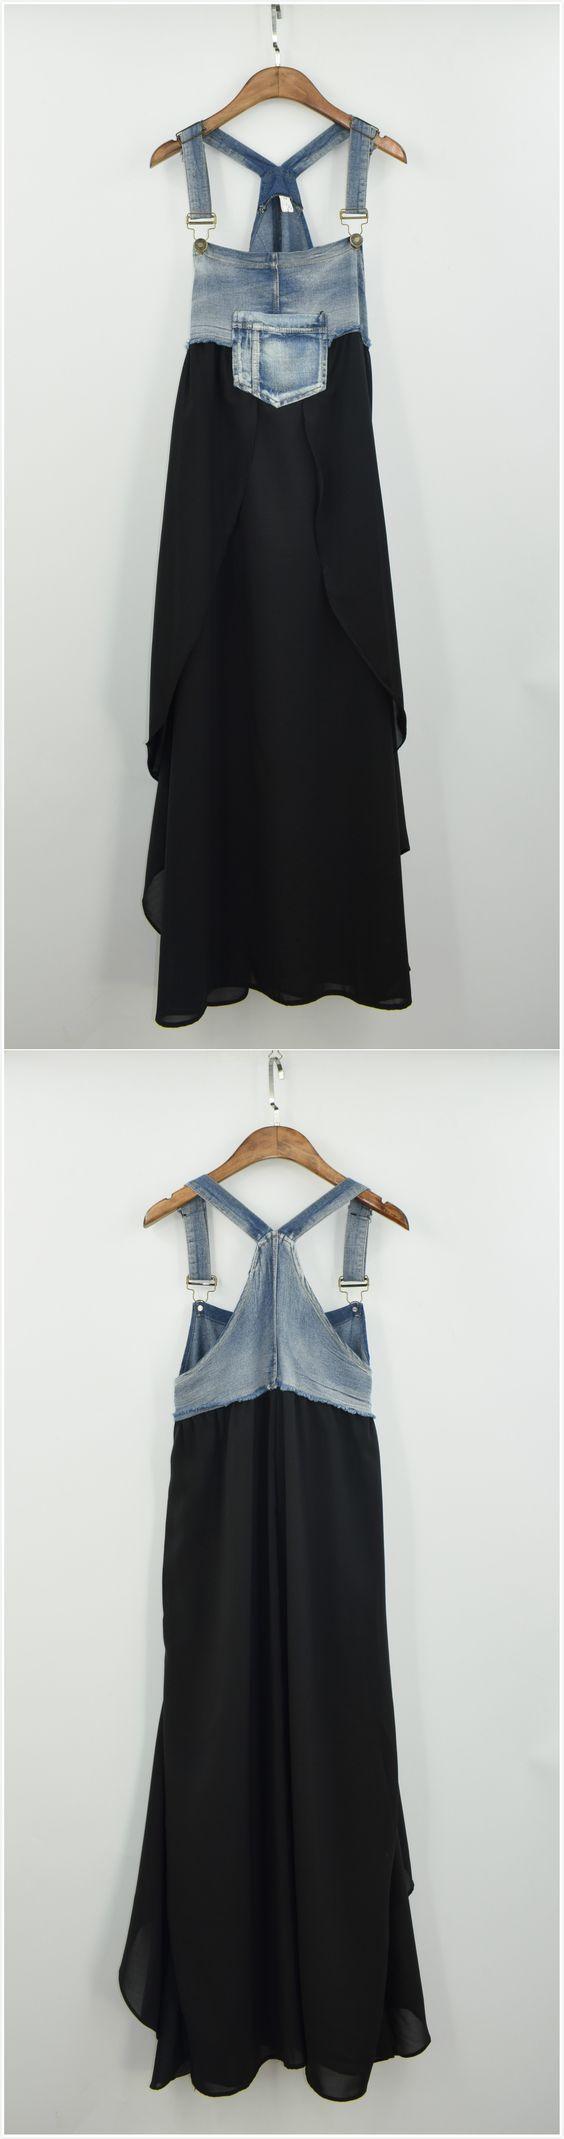 Jual Magnolia Stripe Mini Dress Wanita Cream Beige S Update 2018 Merah 659 Best Sew What For Me Images On Pinterest Diy Clothes Sewing